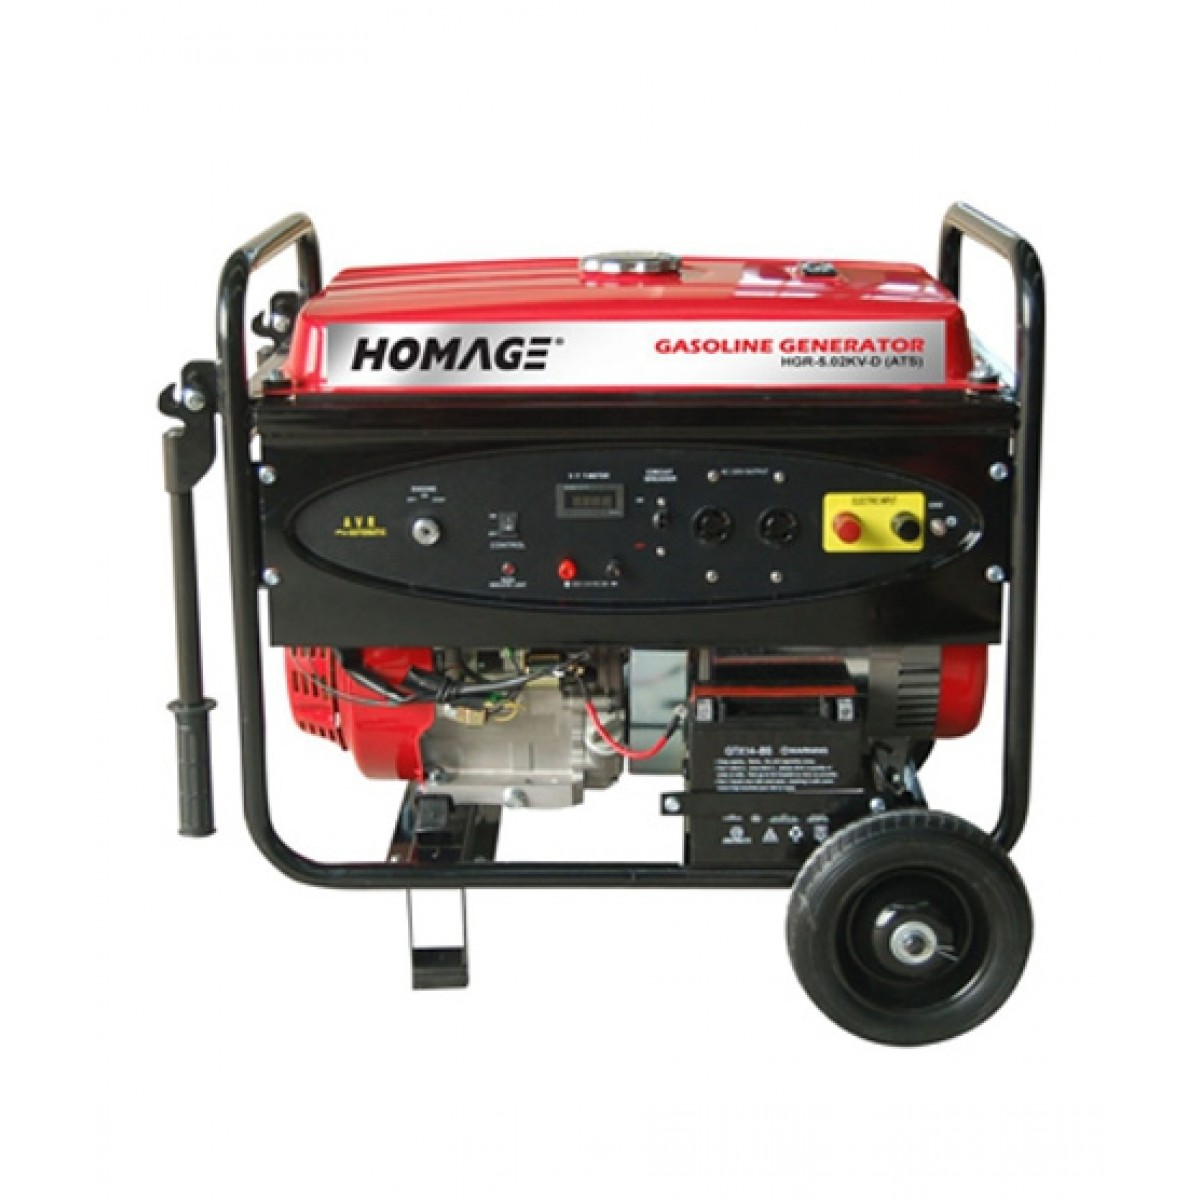 Homage Generator (HGR-5.02 KV-D)